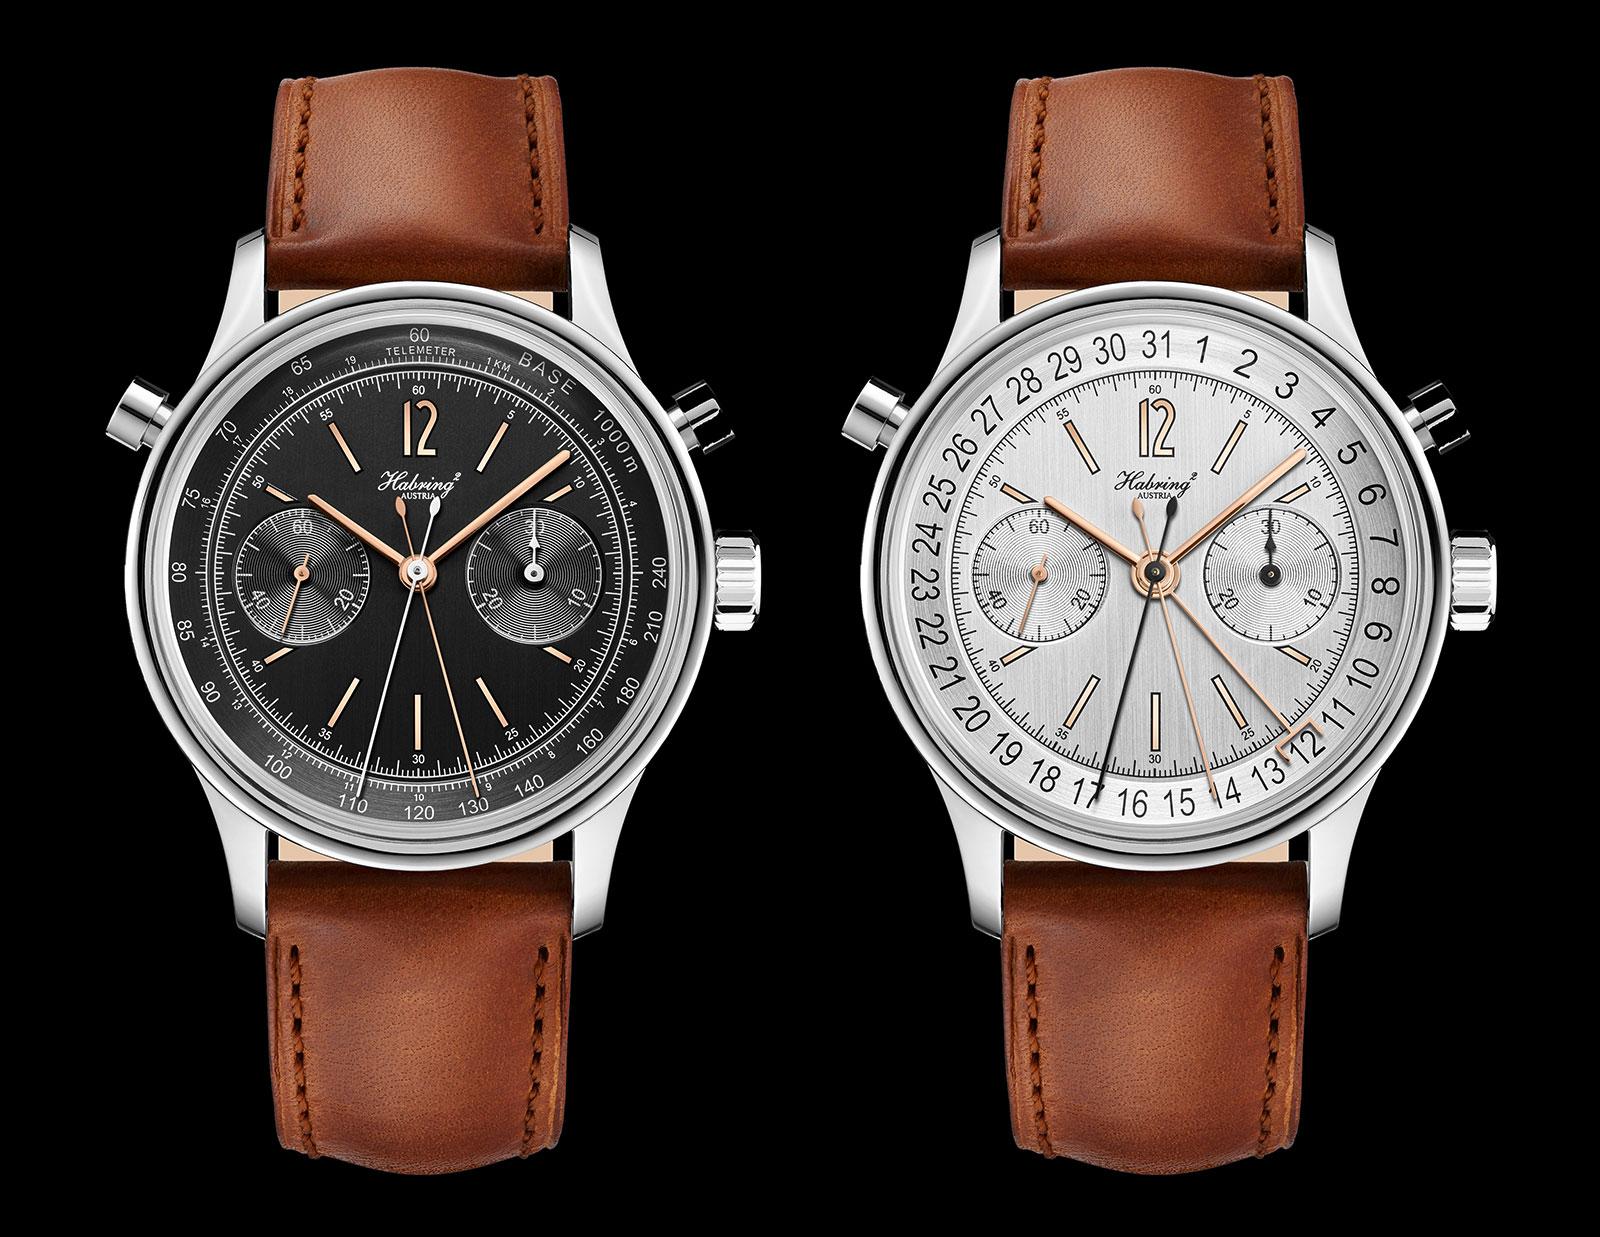 Habring2 Doppel Felix chronograph 2